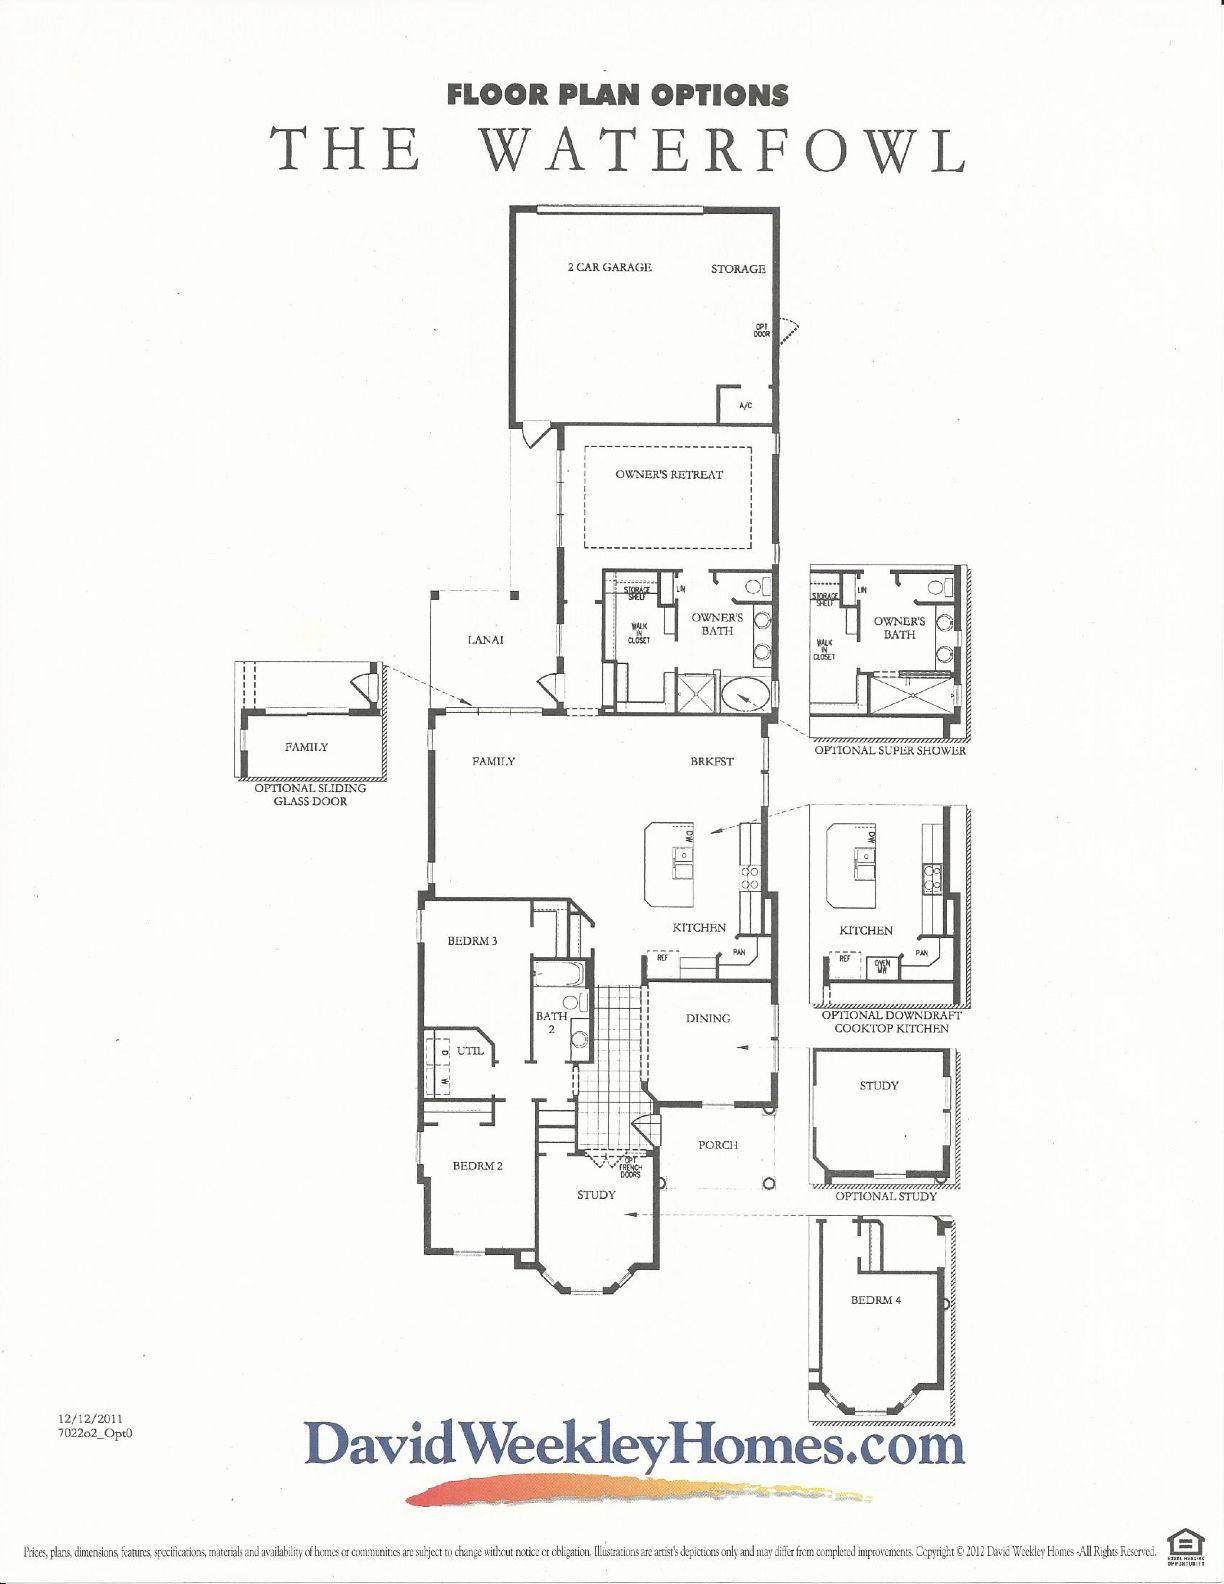 Oakland Park Waterfowl Floor Plan #2 By David Weekly Homes In Winter Garden  FL